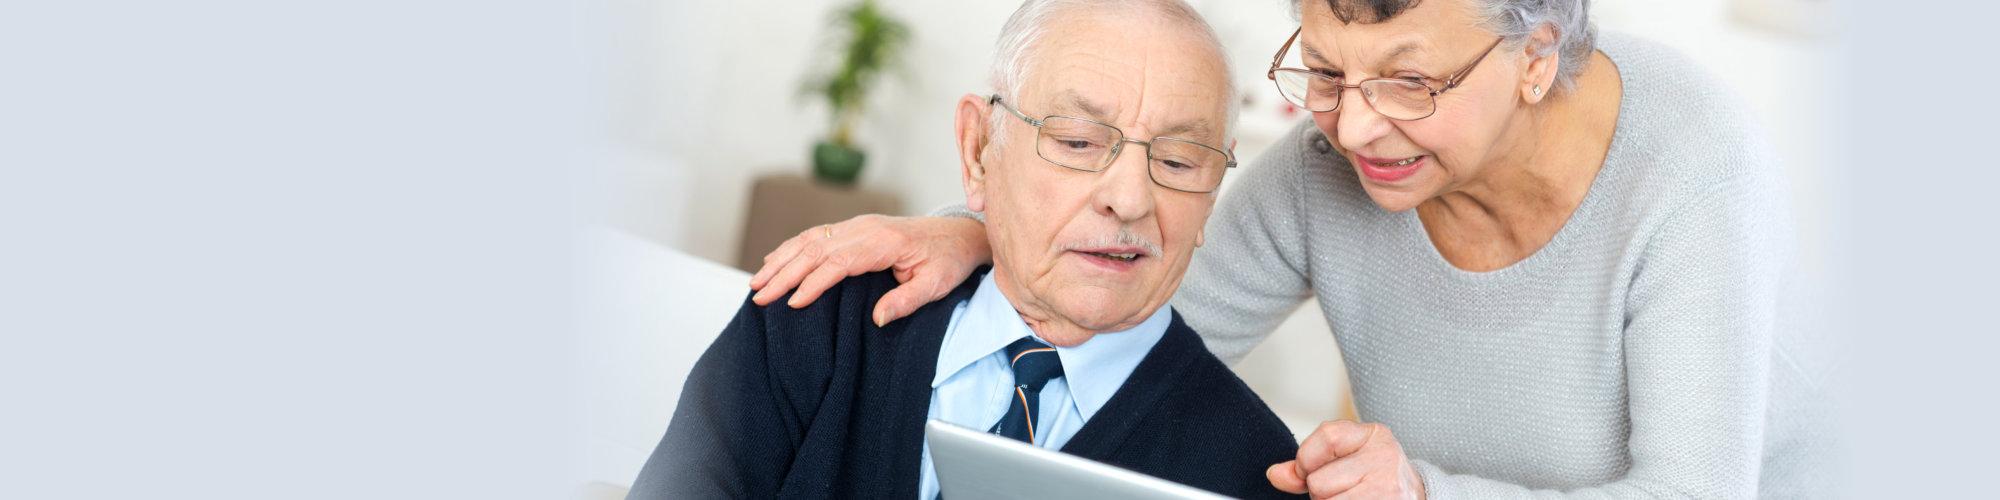 Romantic happy senior man and woman couple